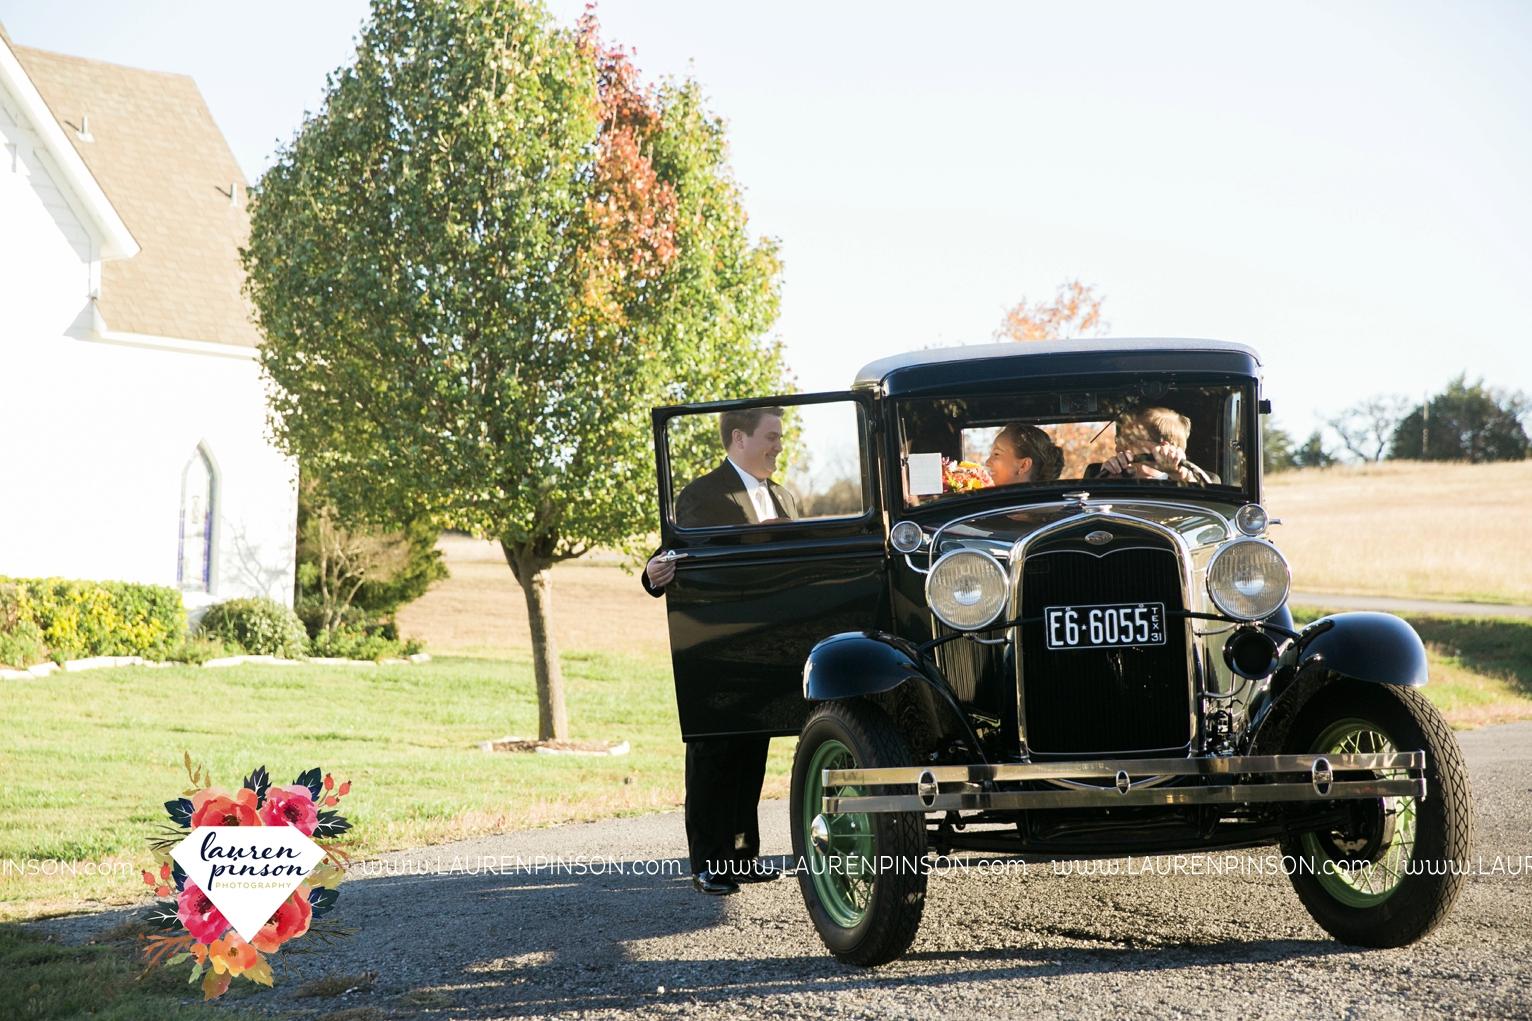 bells-texas-wedding-photography-at-willowood-ranch-chapel-north-texas-wichita-falls-wedding-photographer_1826.jpg